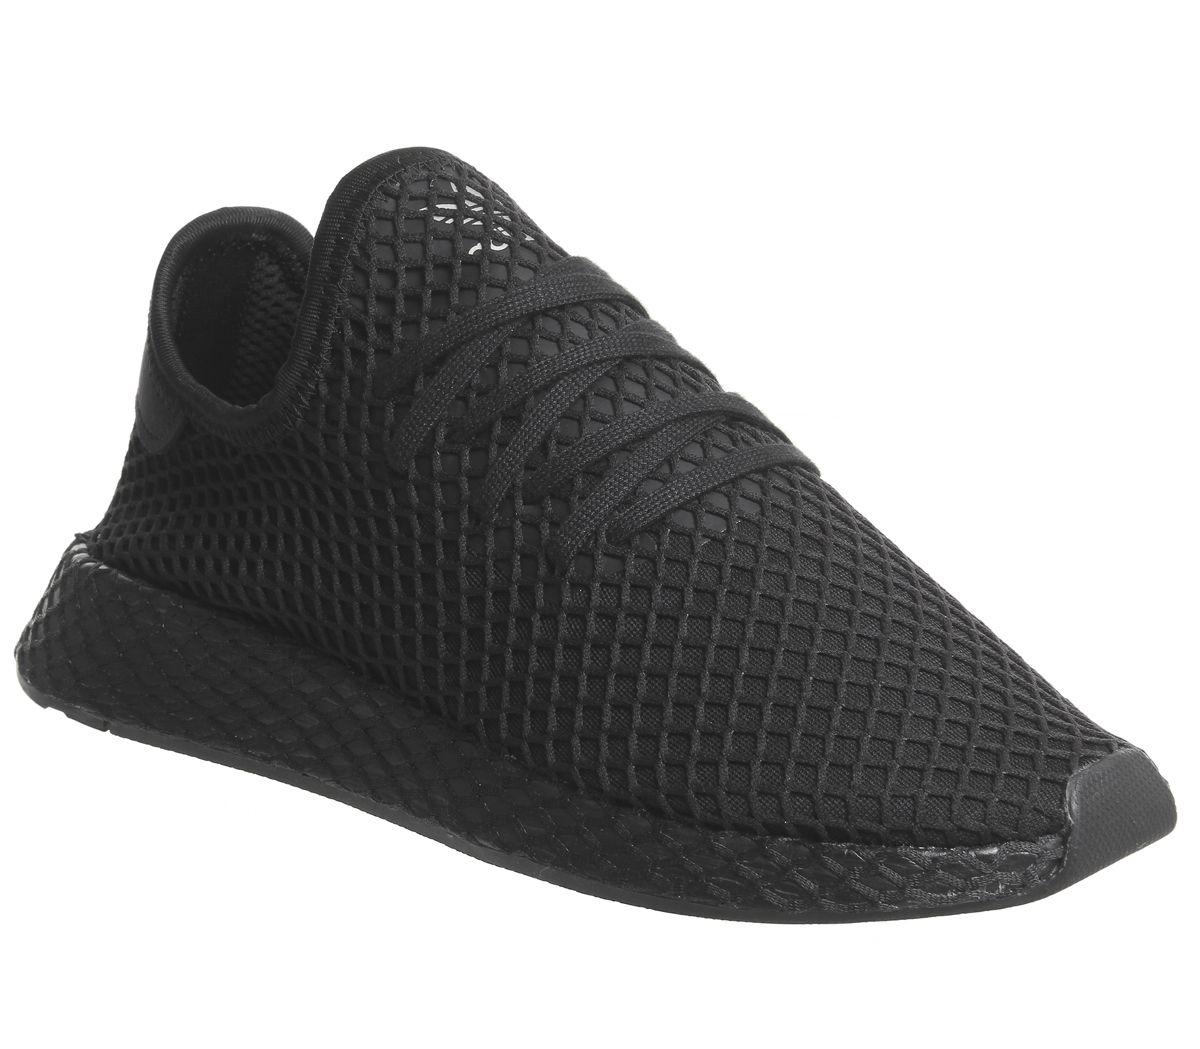 c52dbef5dc443 adidas Deerupt Trainers Core Black Core Black - Unisex Sports